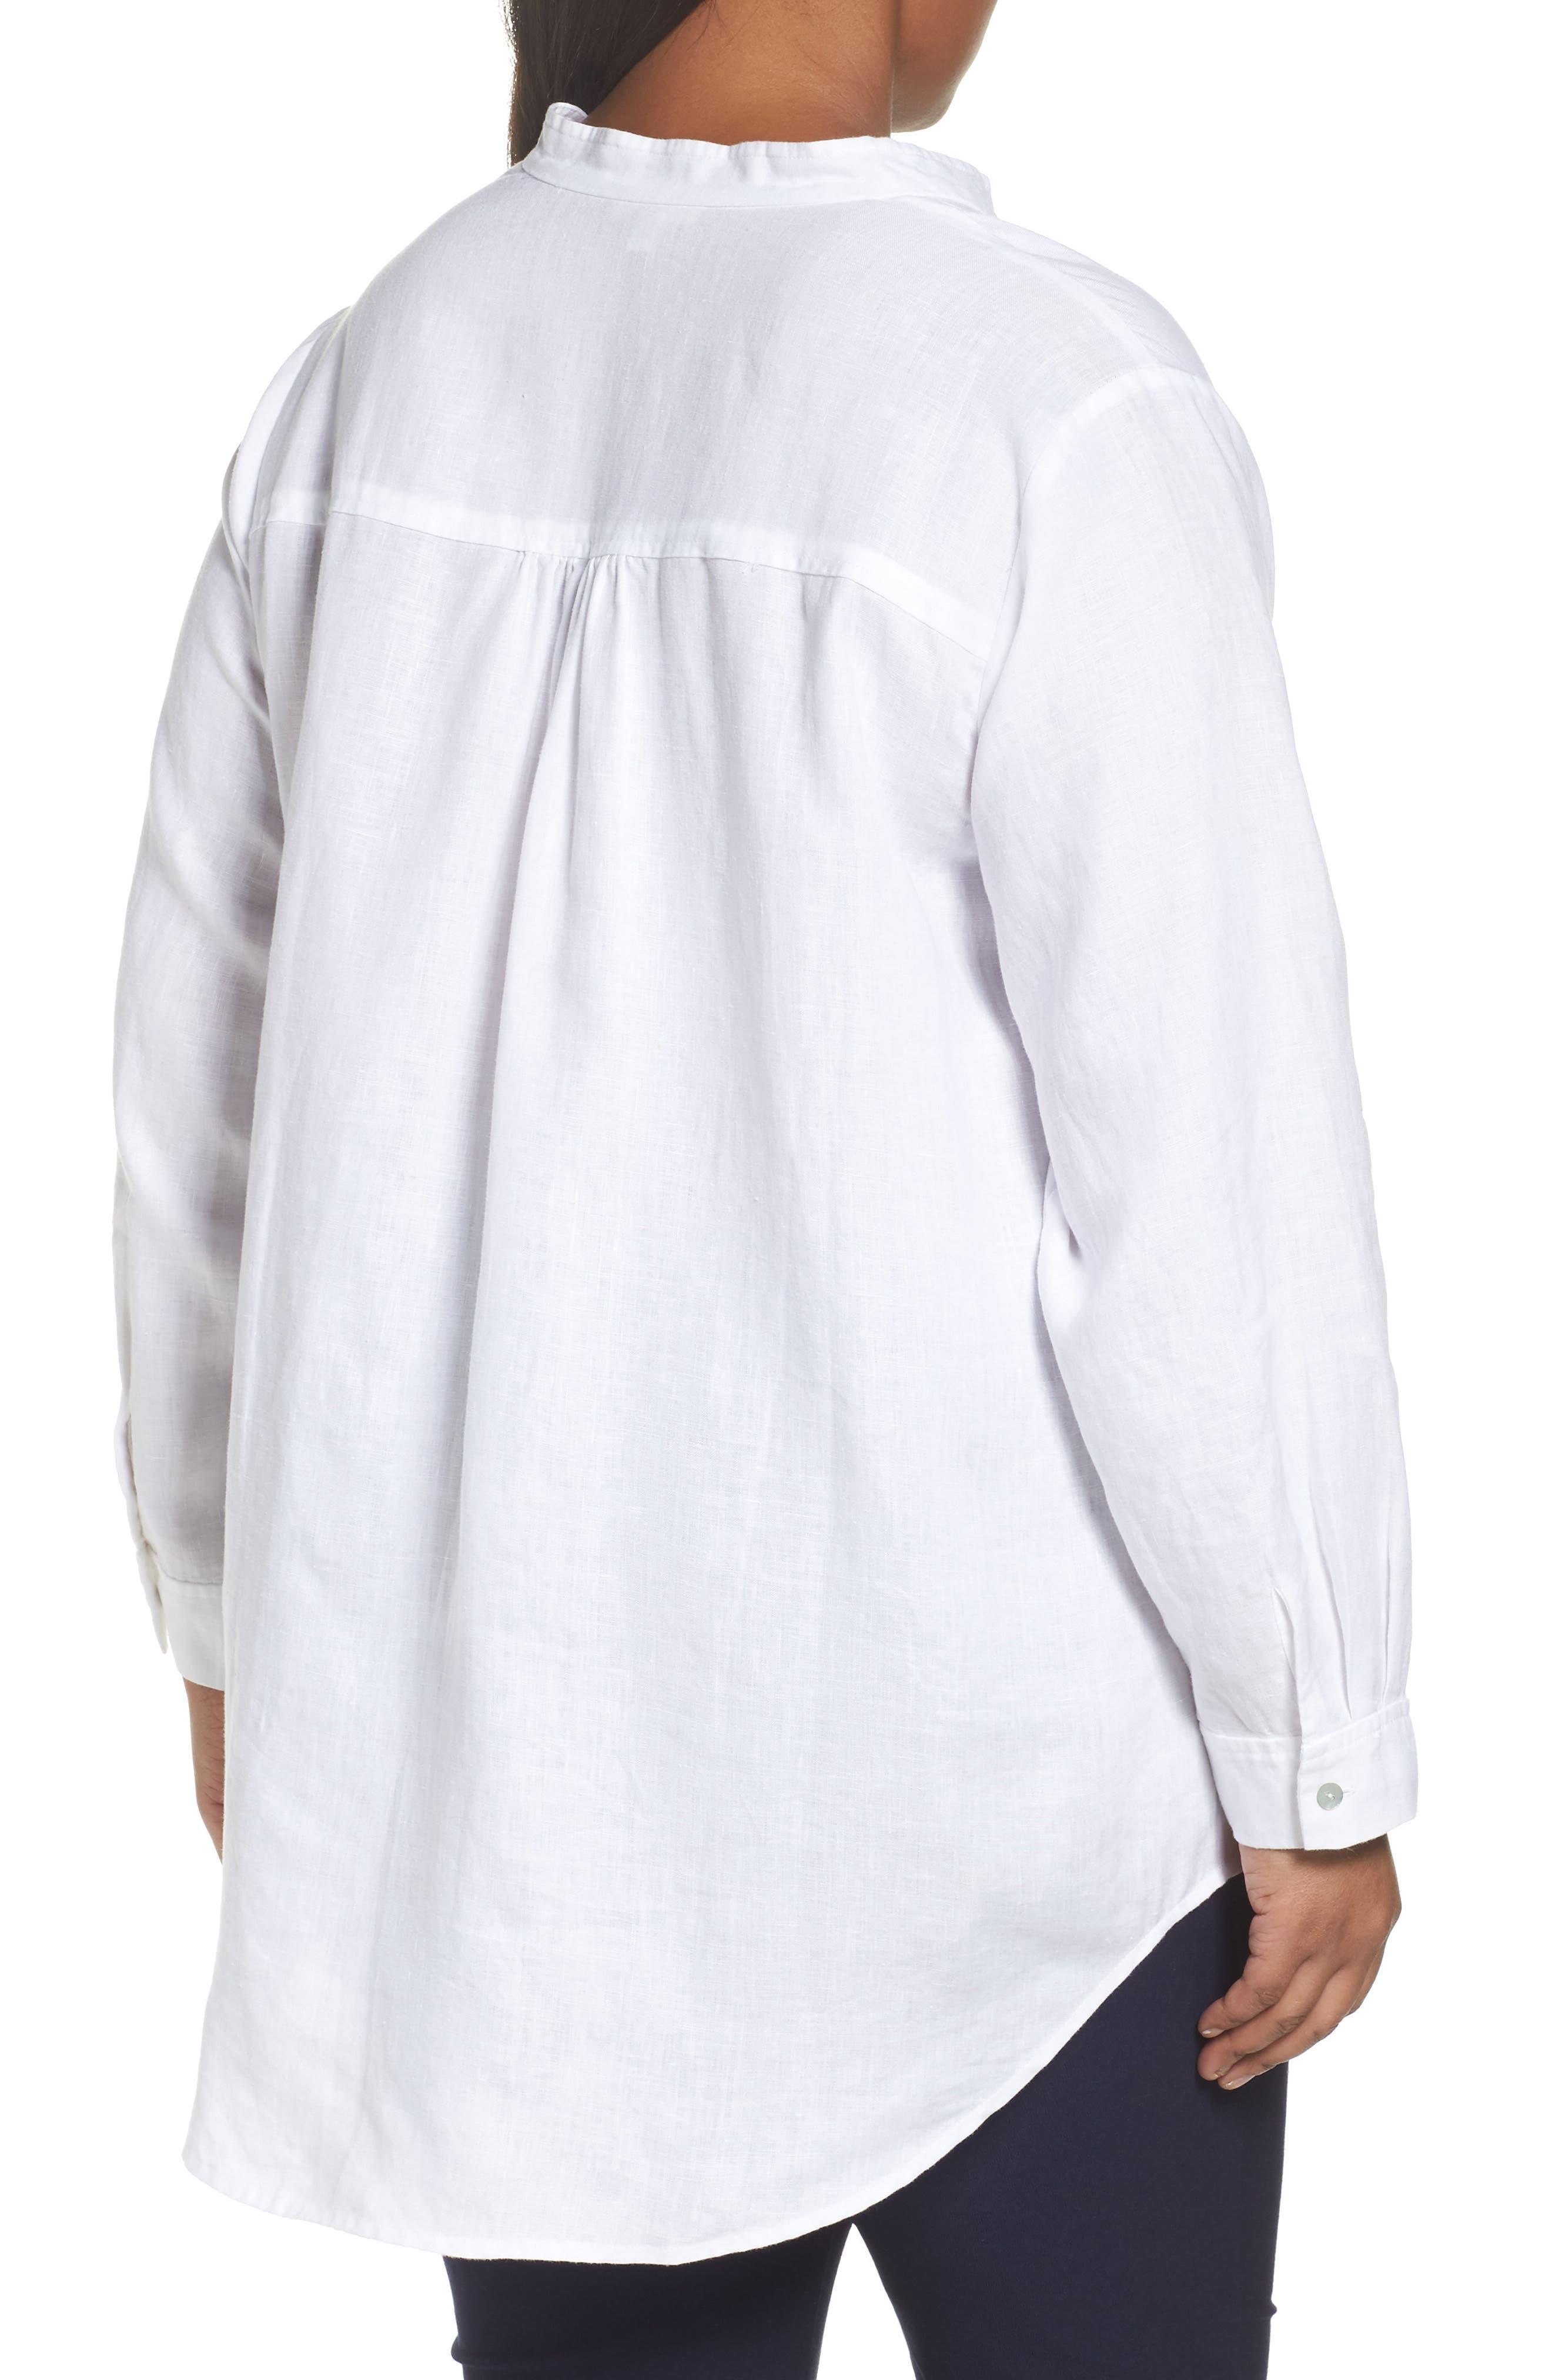 Organic Linen Tunic Shirt,                             Alternate thumbnail 4, color,